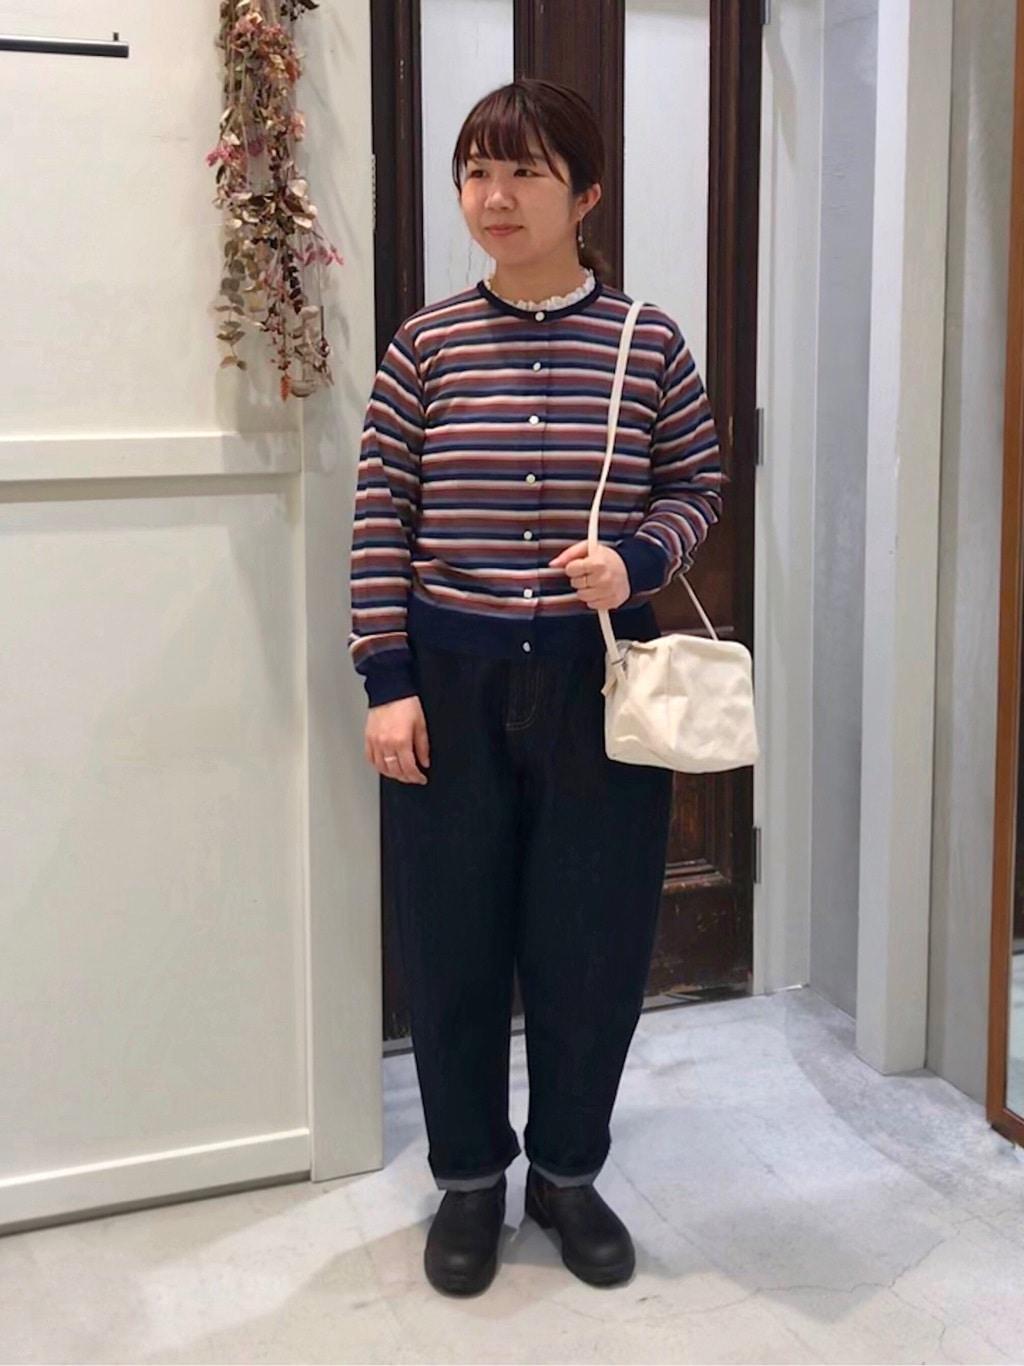 chambre de charme キラリナ京王吉祥寺 身長:155cm 2021.03.22